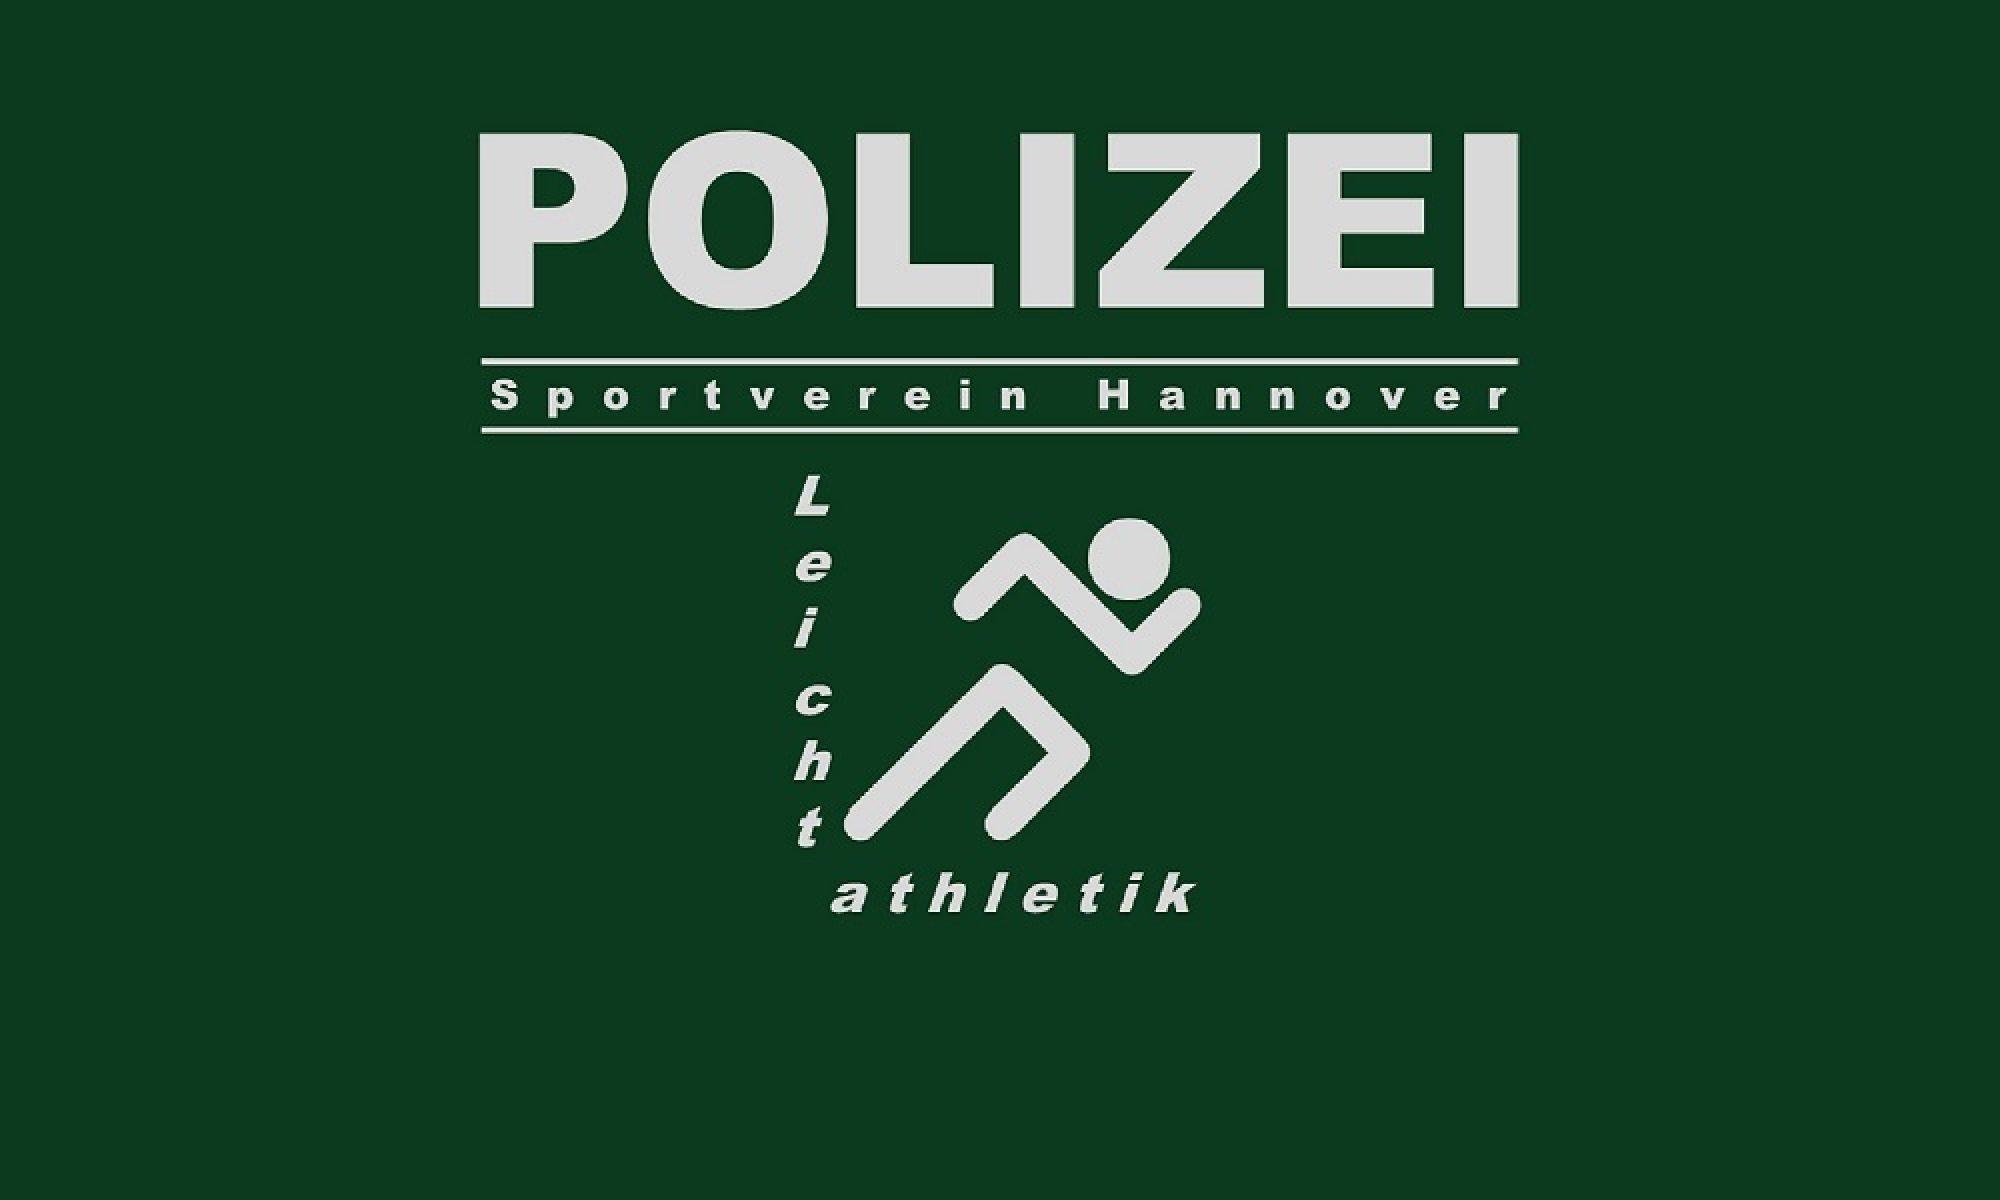 Polizei-SV Hannover - Leichtathletik